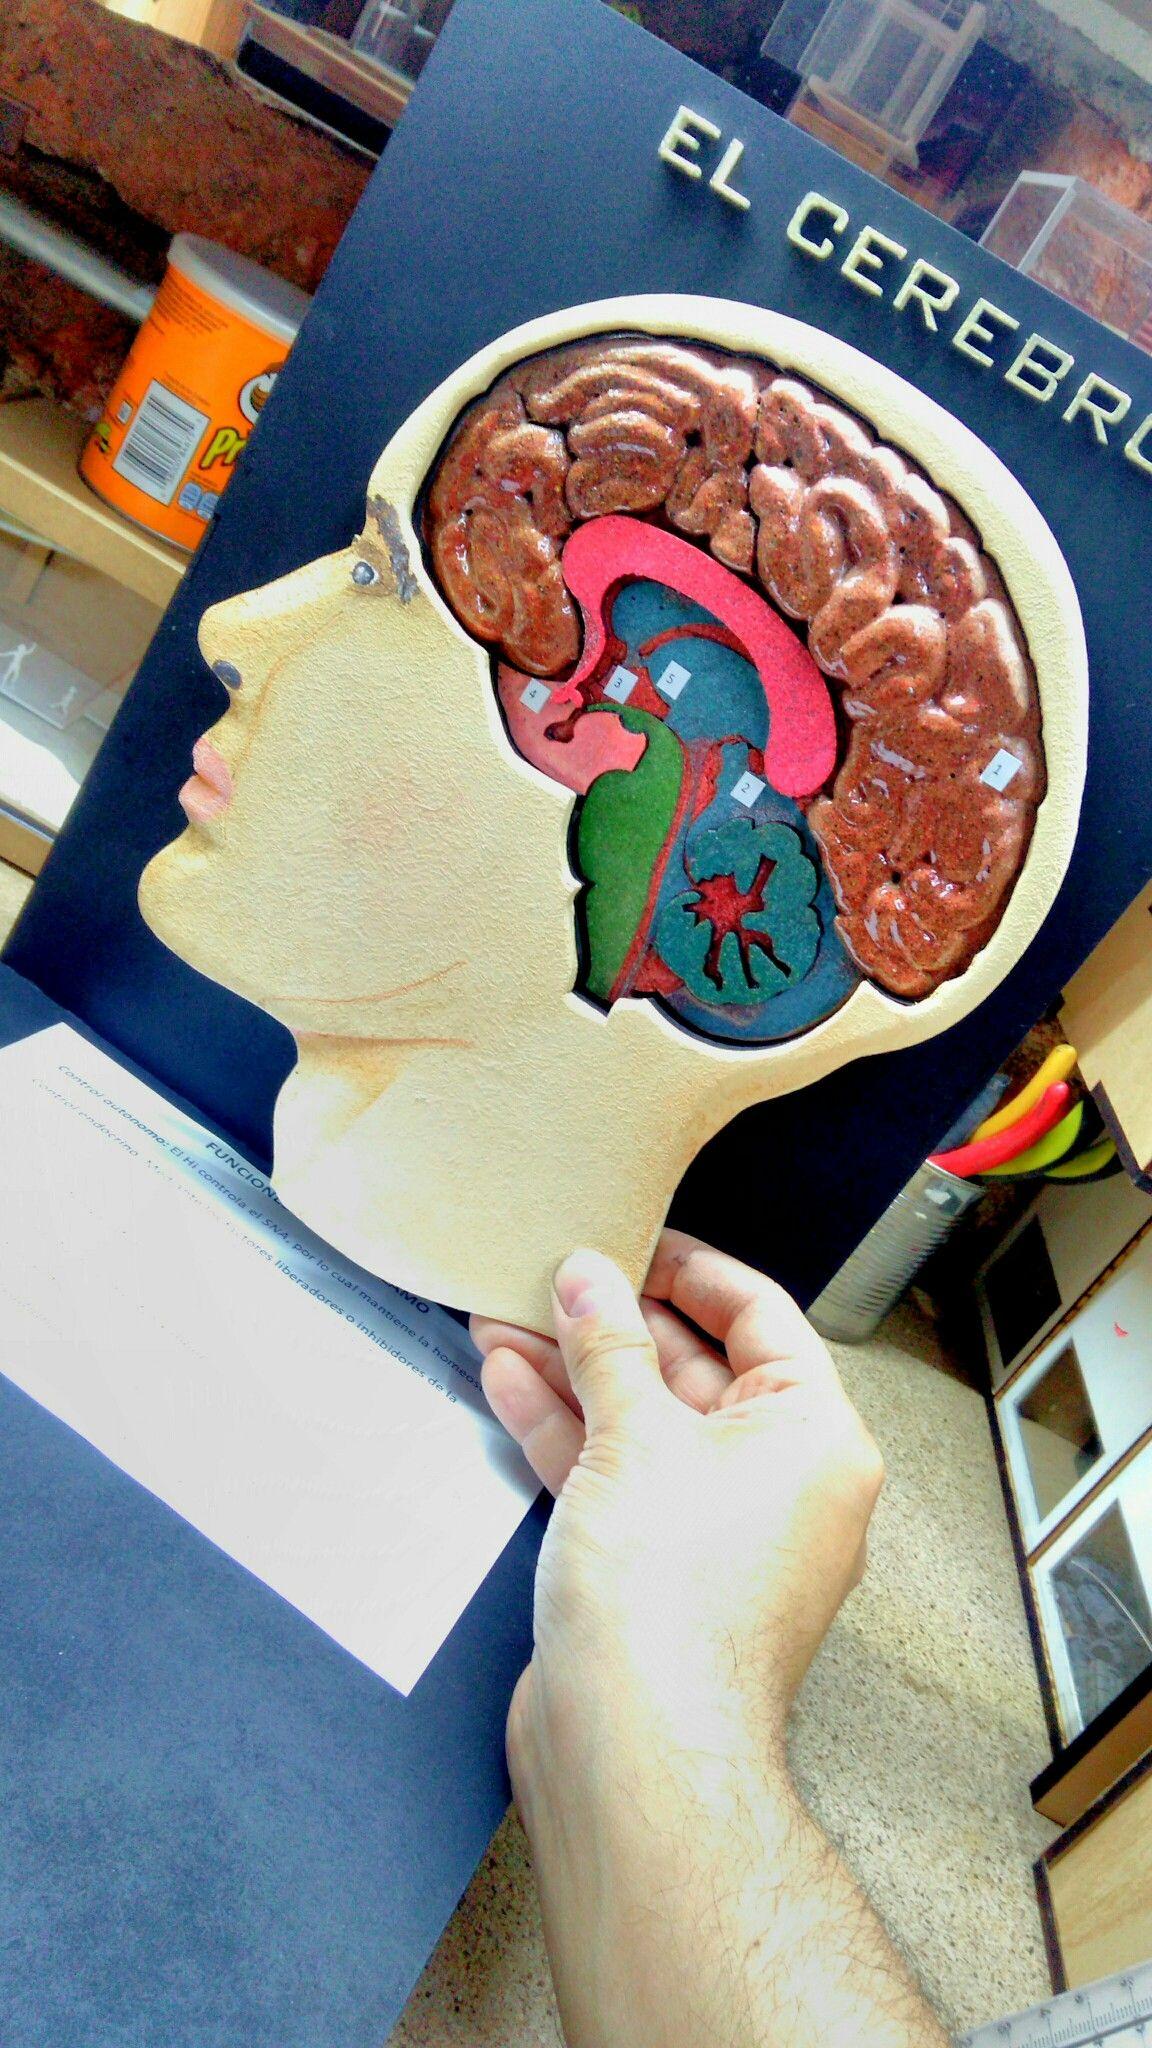 Partes de cerebro (Maquetas) | idea de maqueta | Pinterest ...